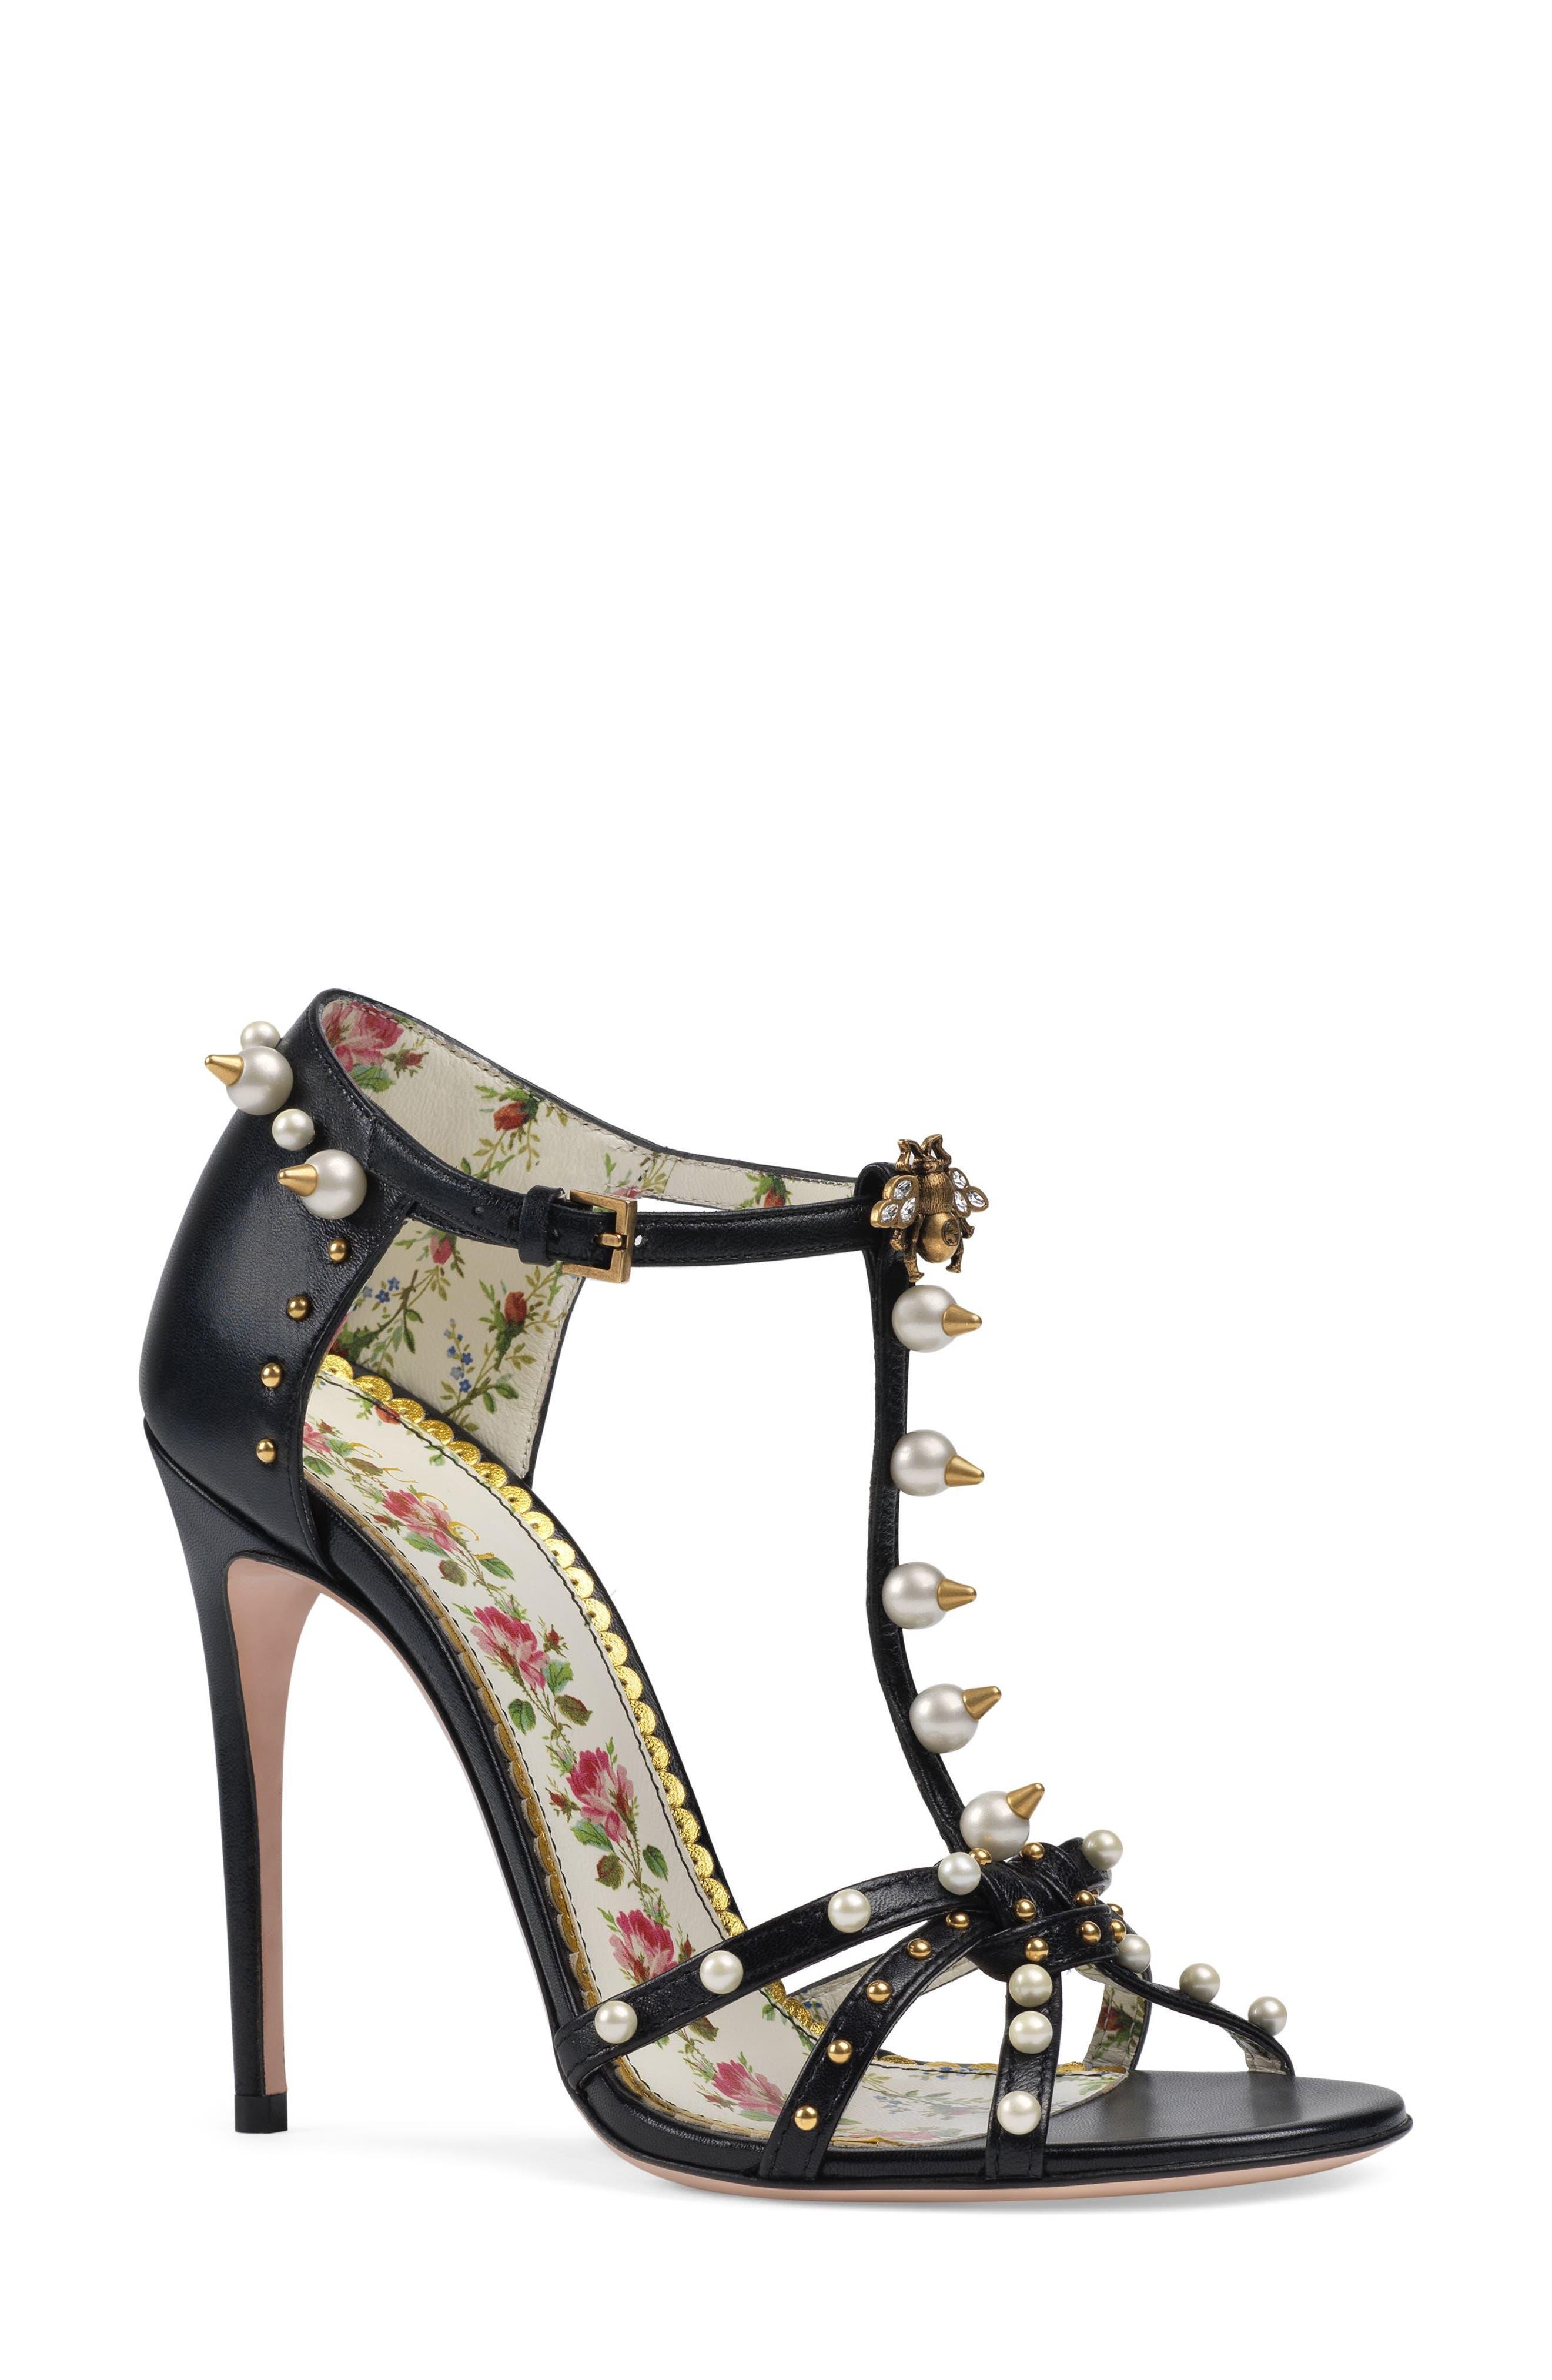 Main Image - Gucci Regina Embellished T-Strap Sandal (Women)